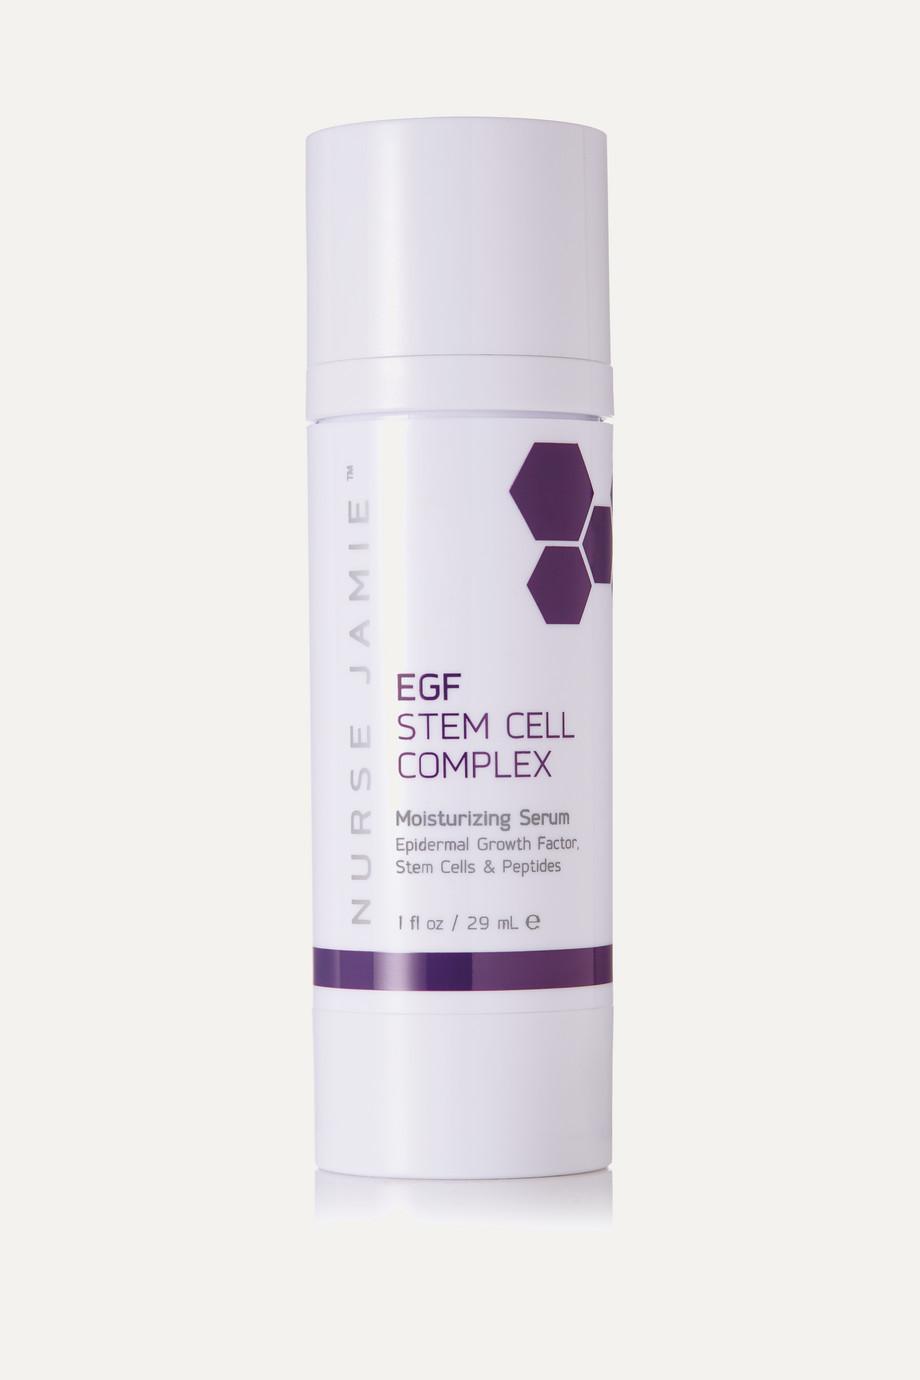 EGF Stem Cell Complex, 29ml, by Nurse Jamie